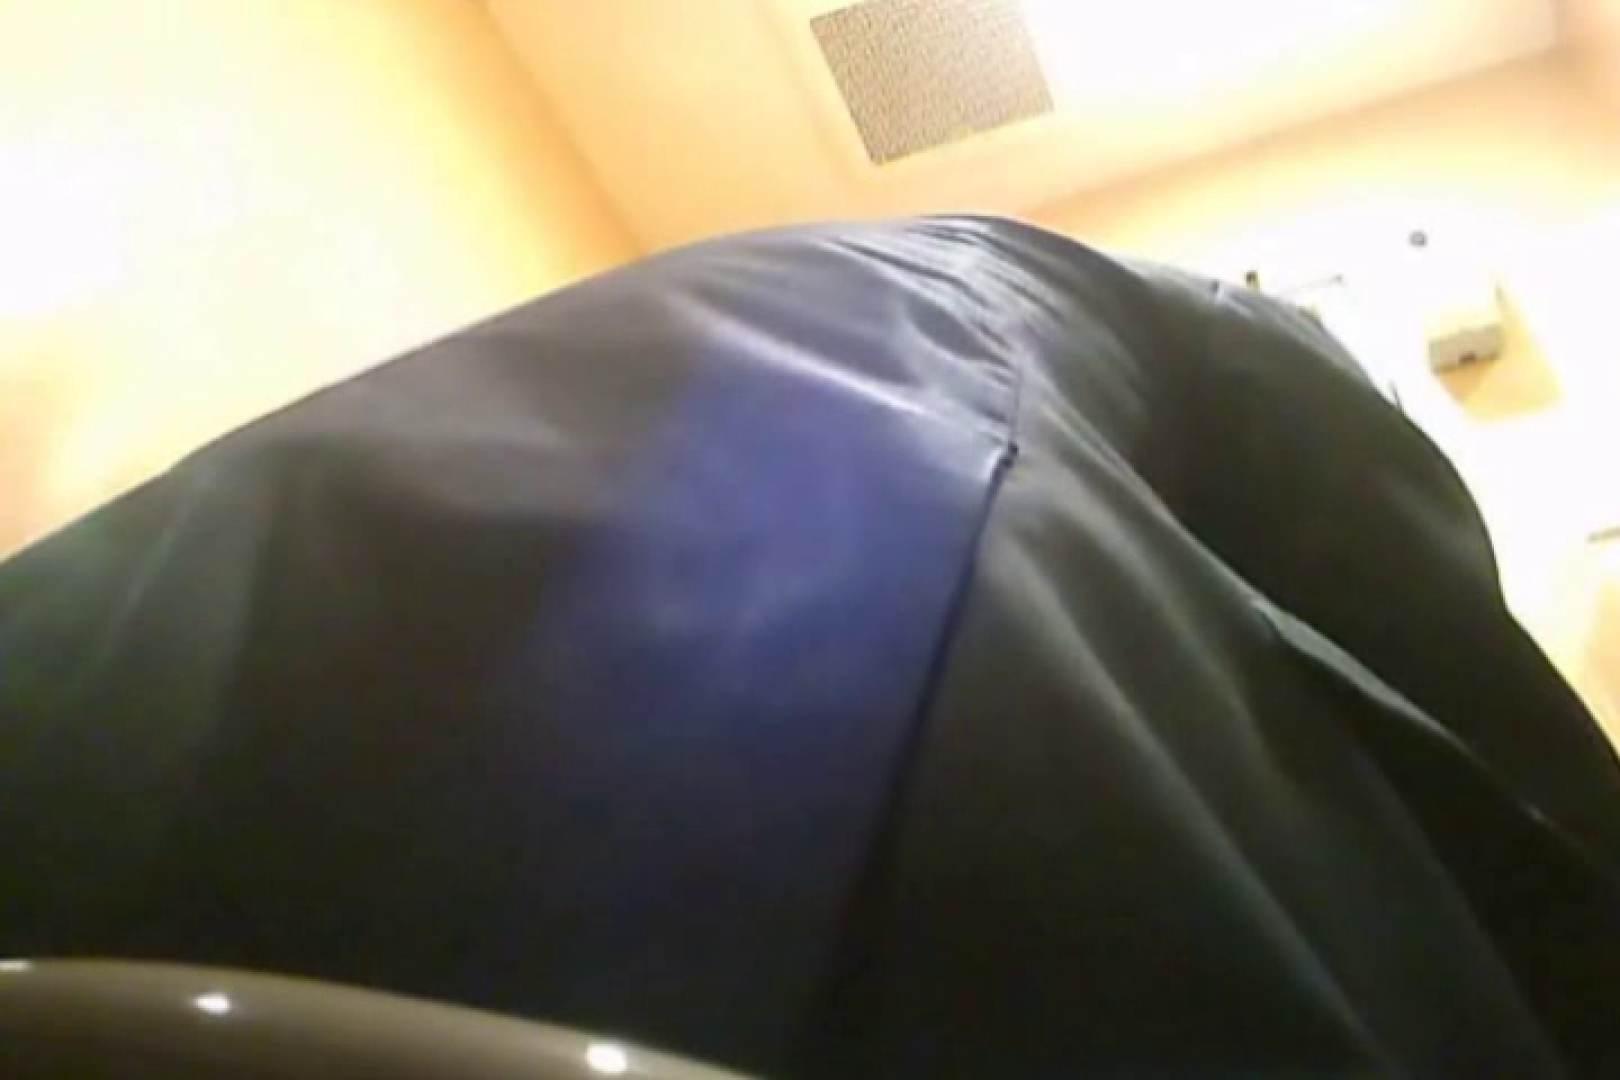 SEASON 3rd!掴み取りさんの洗面所覗き!in新幹線!VOL.03 ノンケ ゲイアダルト画像 71連発 29